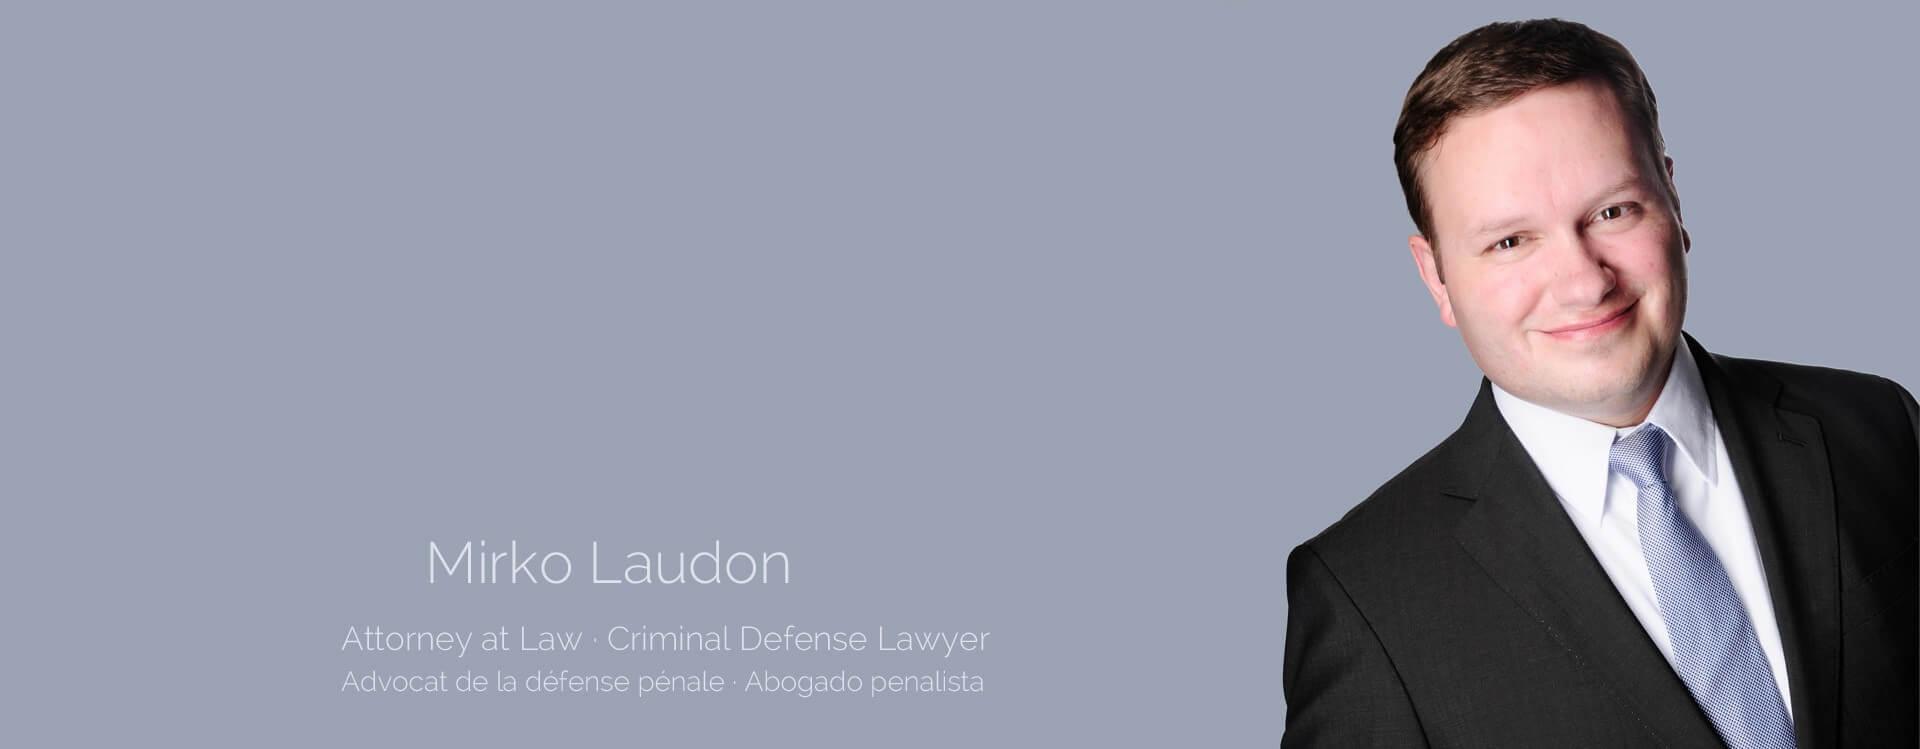 Advogado, defese, alemäo, defesa criminal, abogado, avocet, hamburgo, laudon, german, Alman, agir ceza, Avukati, Avukat